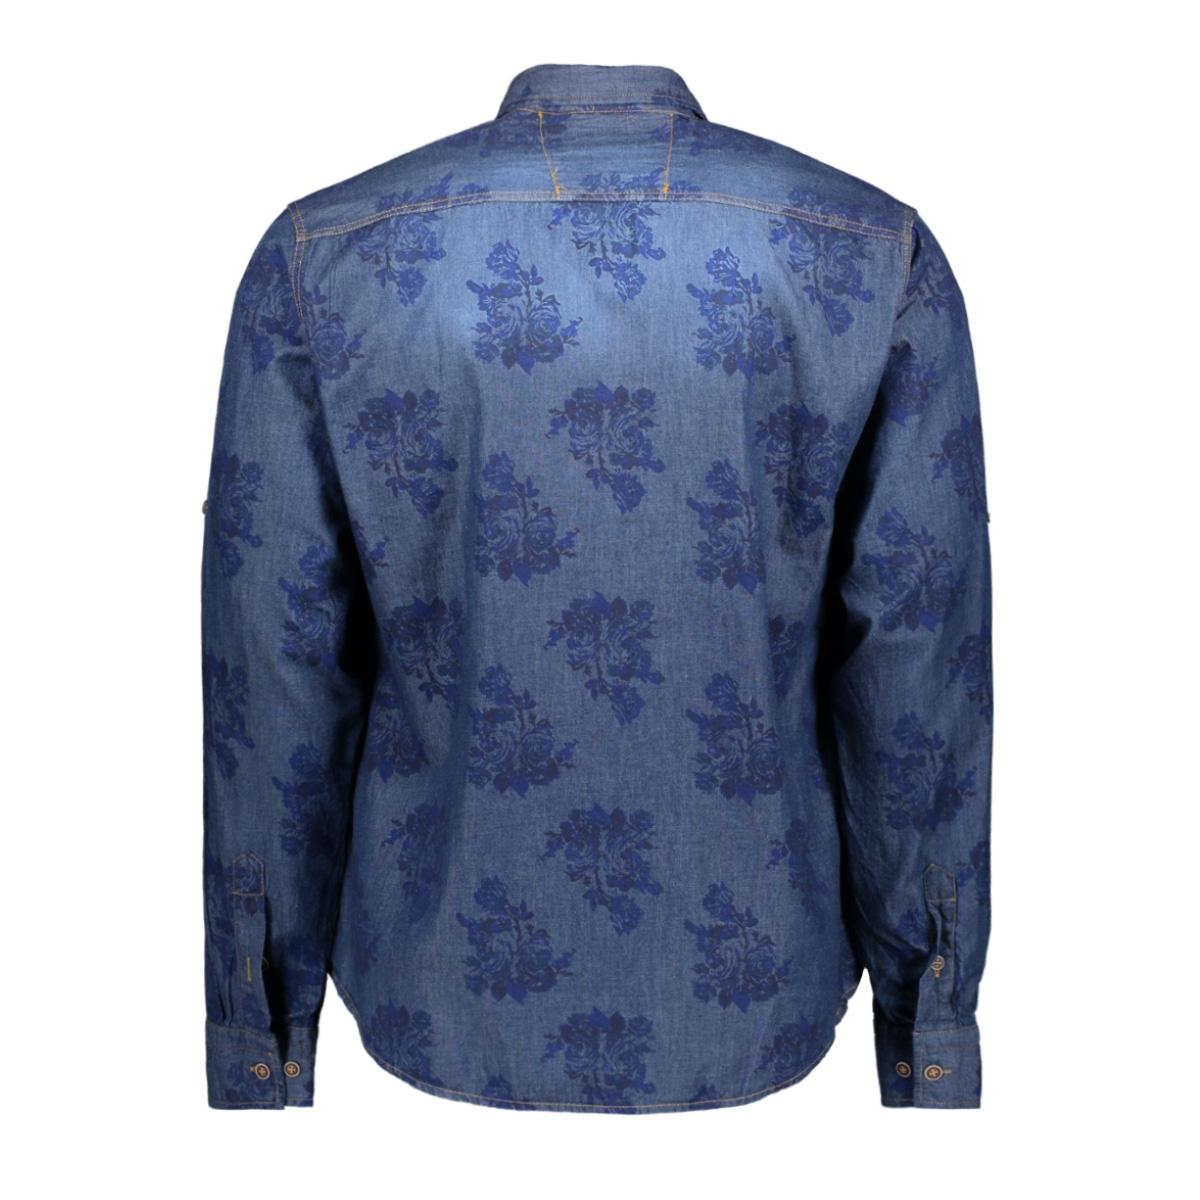 4859 gabbiano overhemd denim